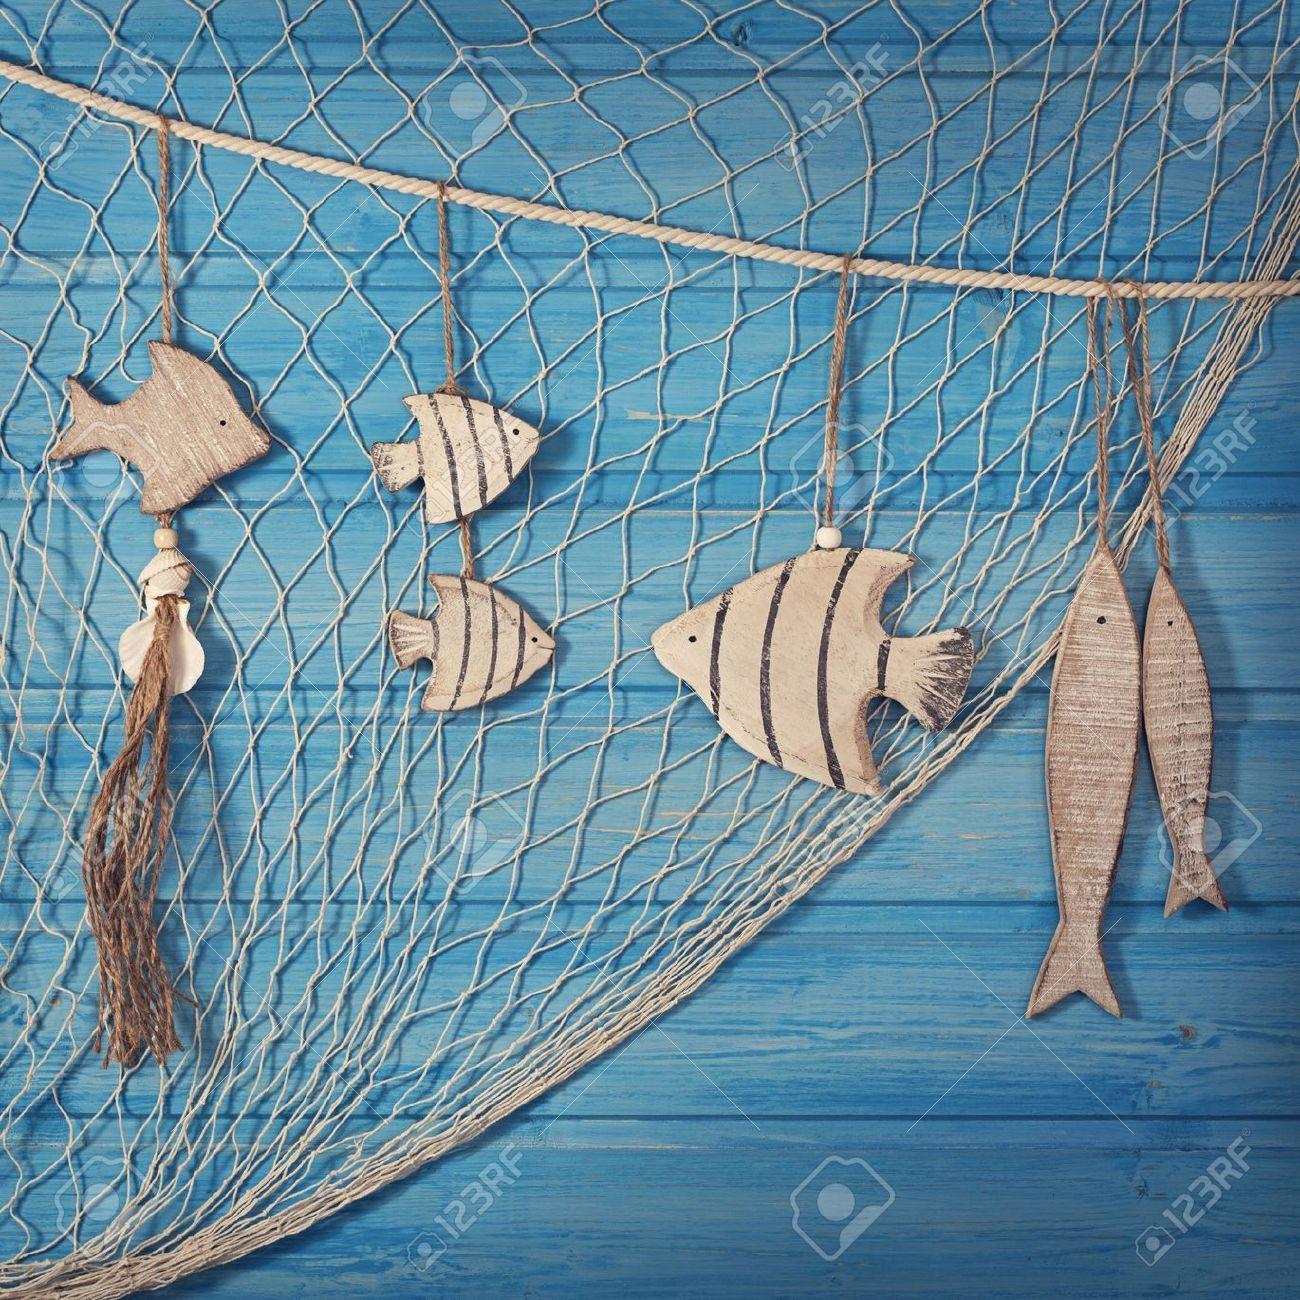 Marine Life Decoration And On Blue Shabby Background Blue White Fishing Net Wall Bar